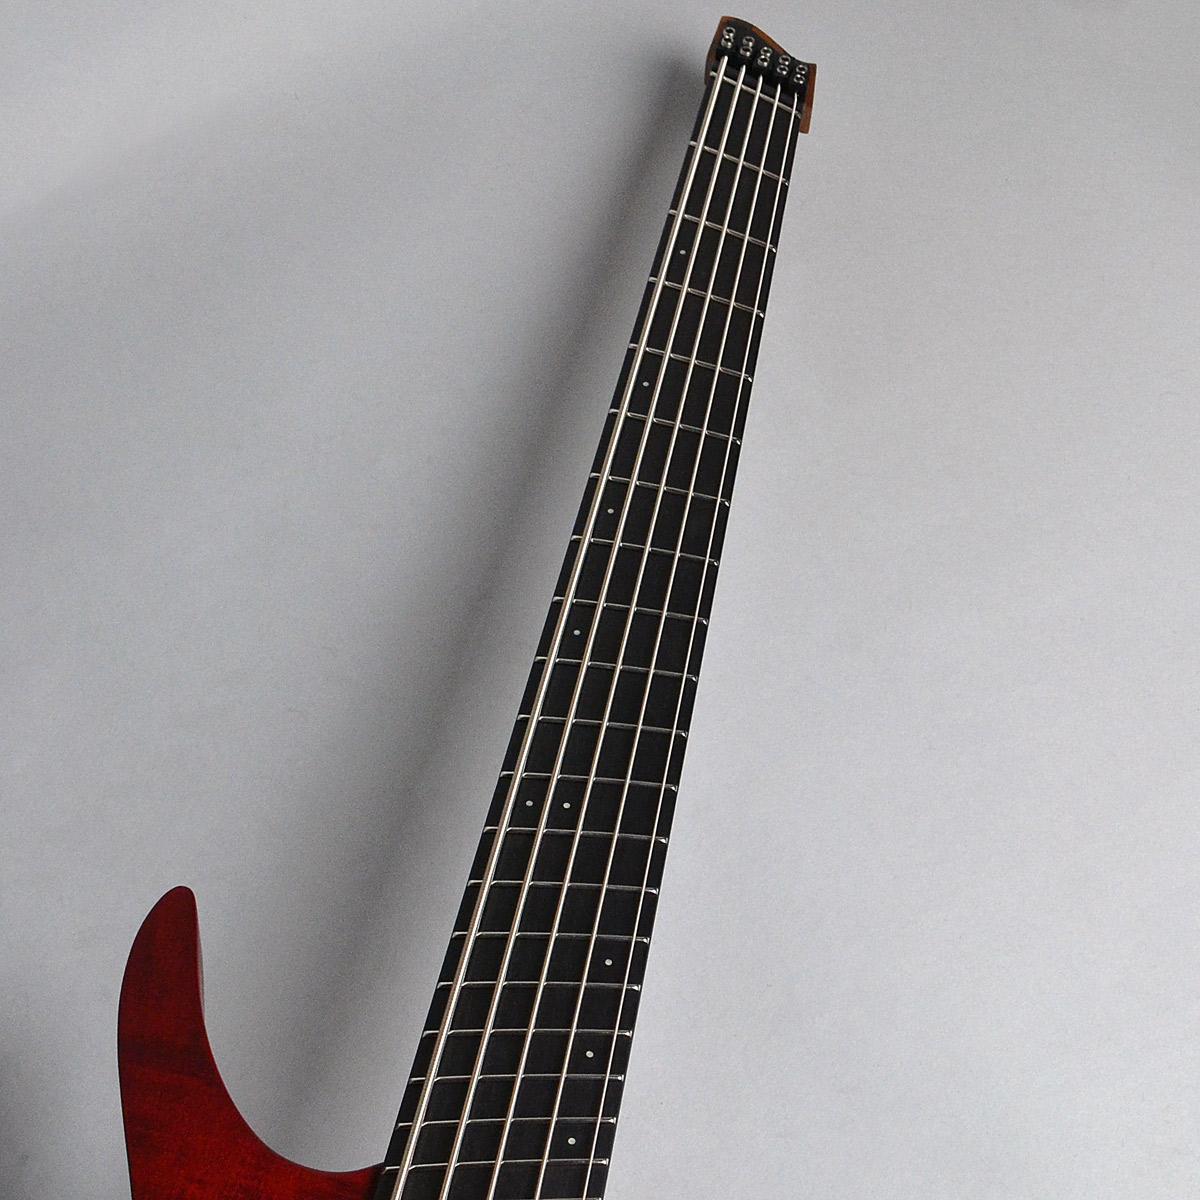 Boden Prog Bass 5stの指板画像